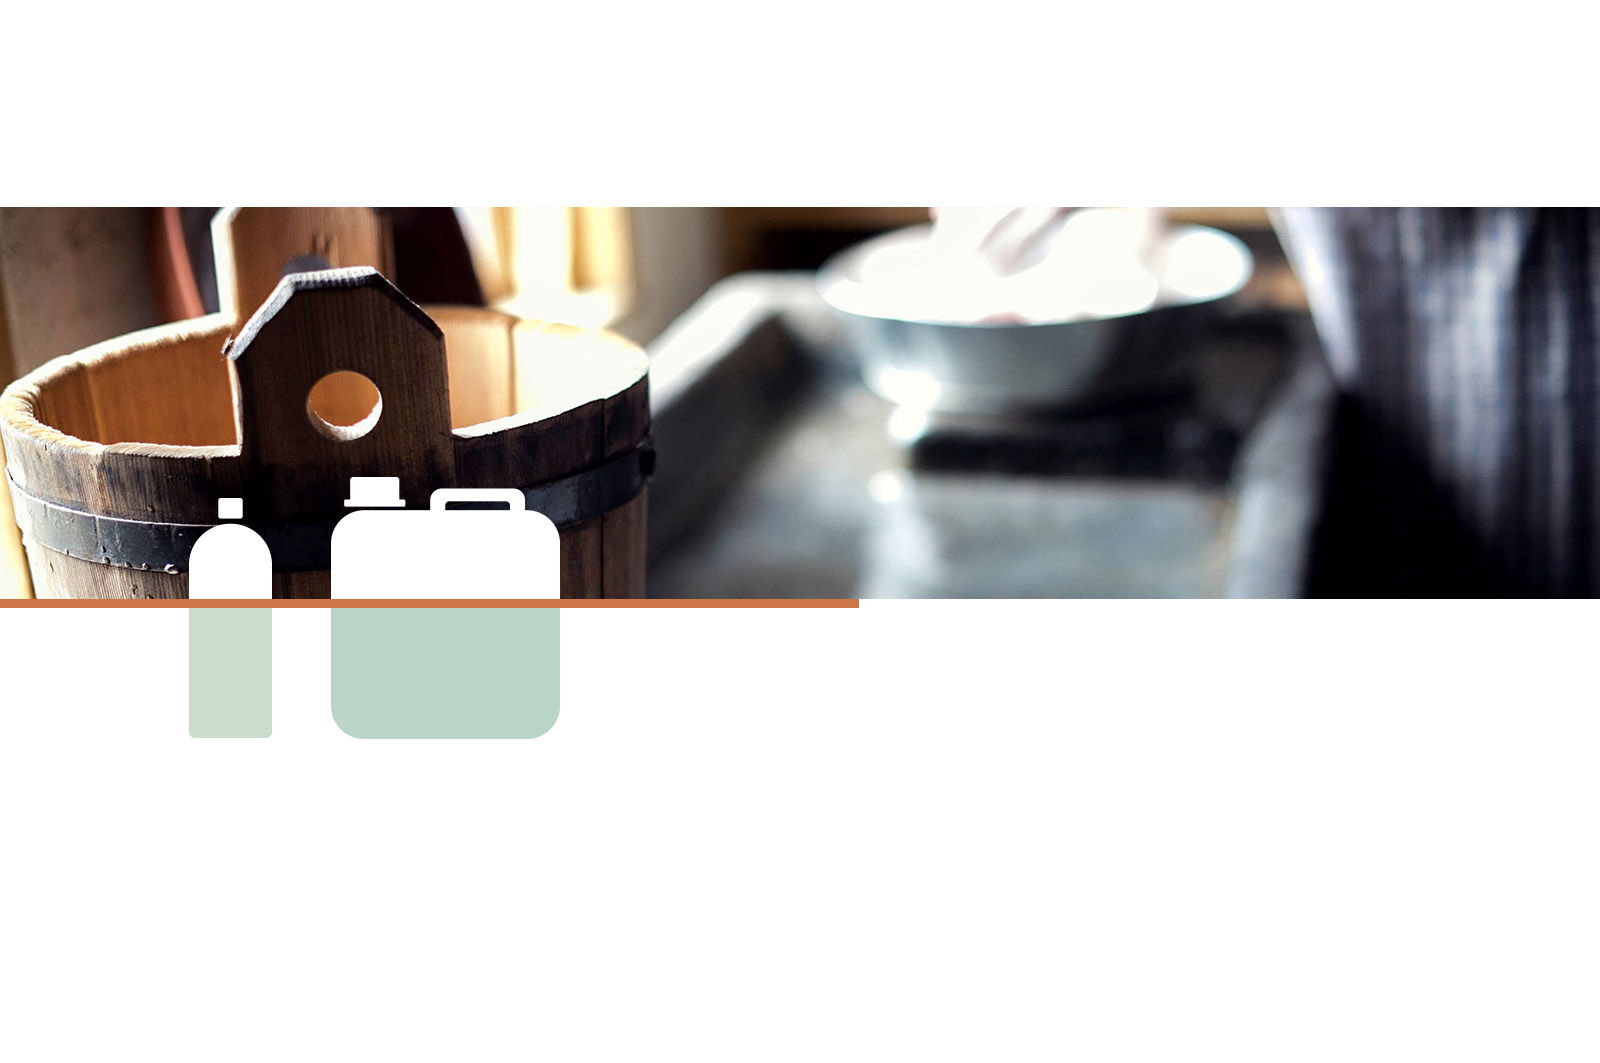 Titelbild_Haushalt_Reiniger_Eussenheimer_Manufaktur